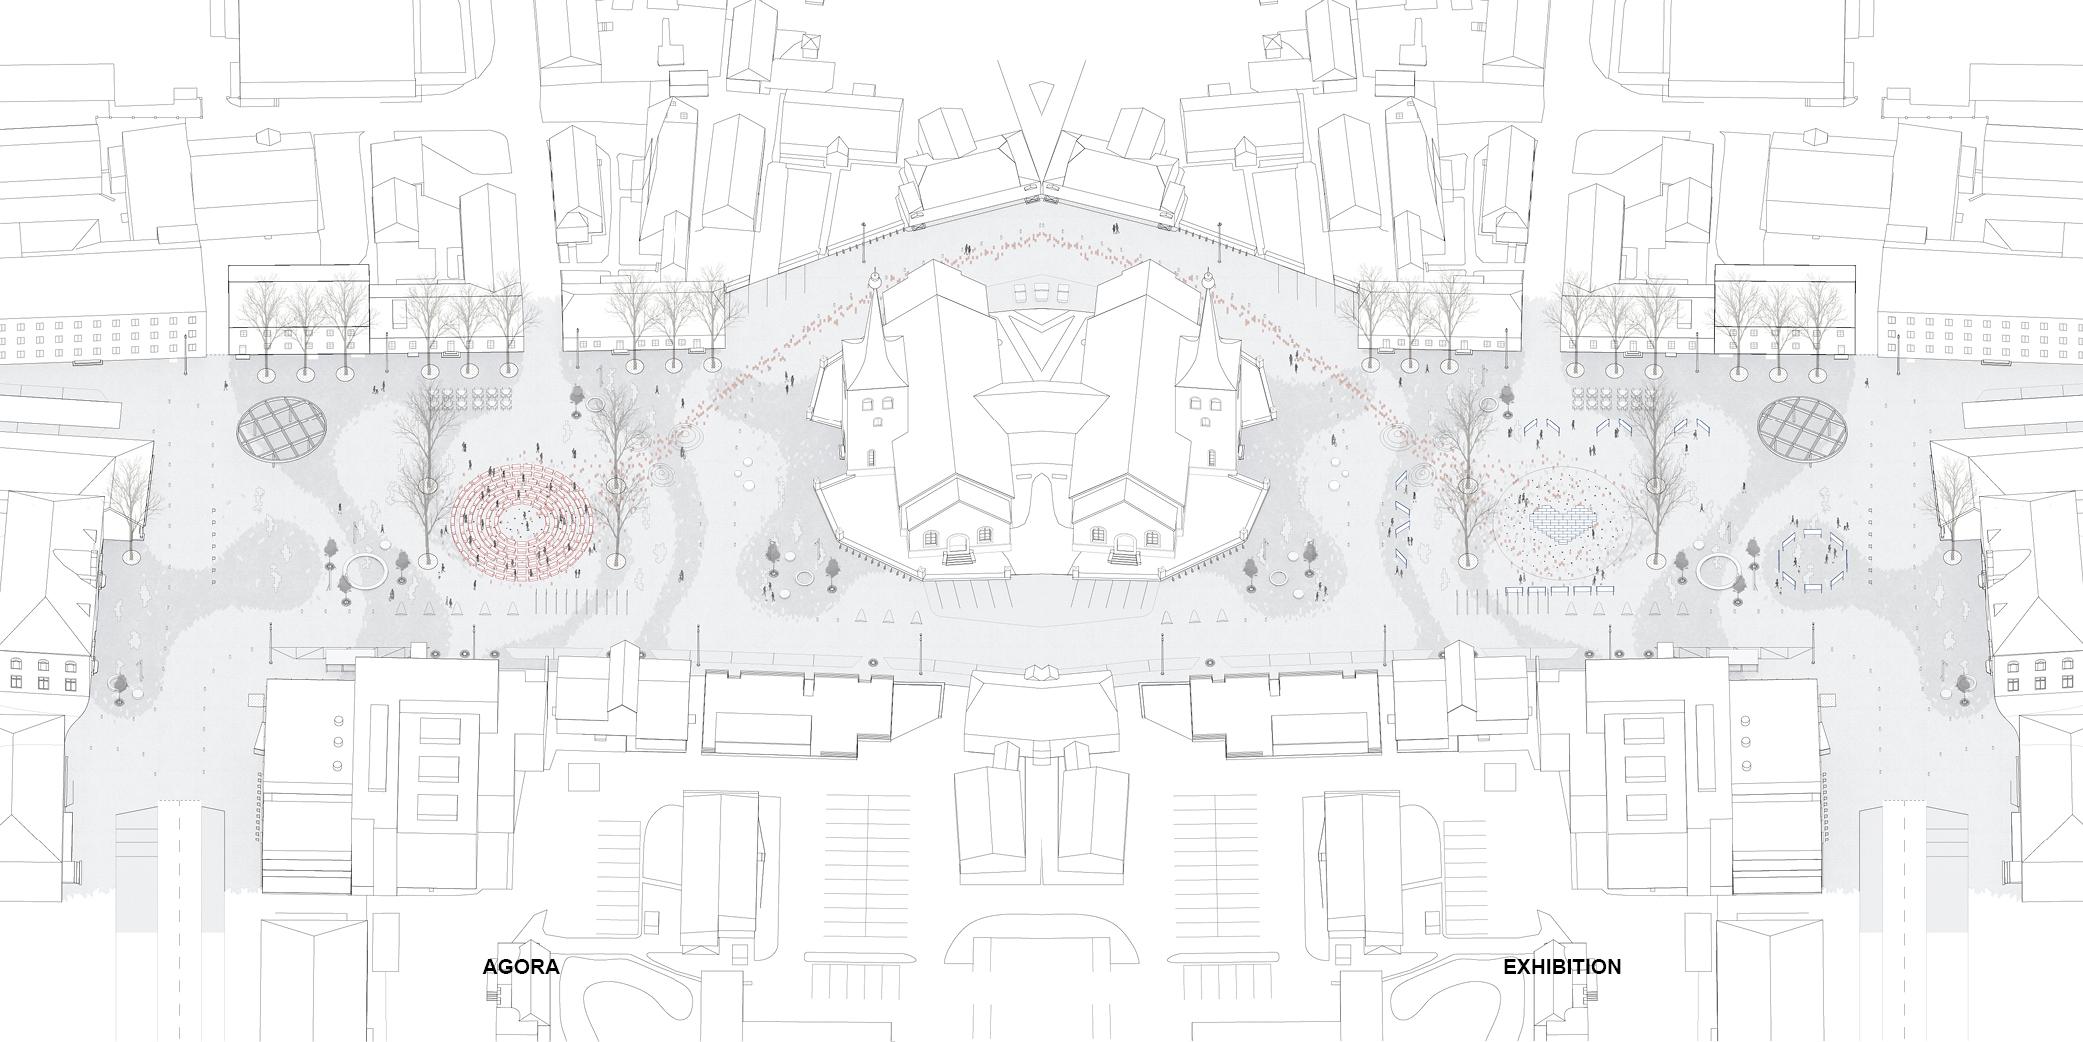 OCA architects urban architecture competition Paide Central Paide keskvaljaku arhitektuurivoistluse Hernan Lleida Ruiz Bernardo Garcia Morales Linn Nagel_web15